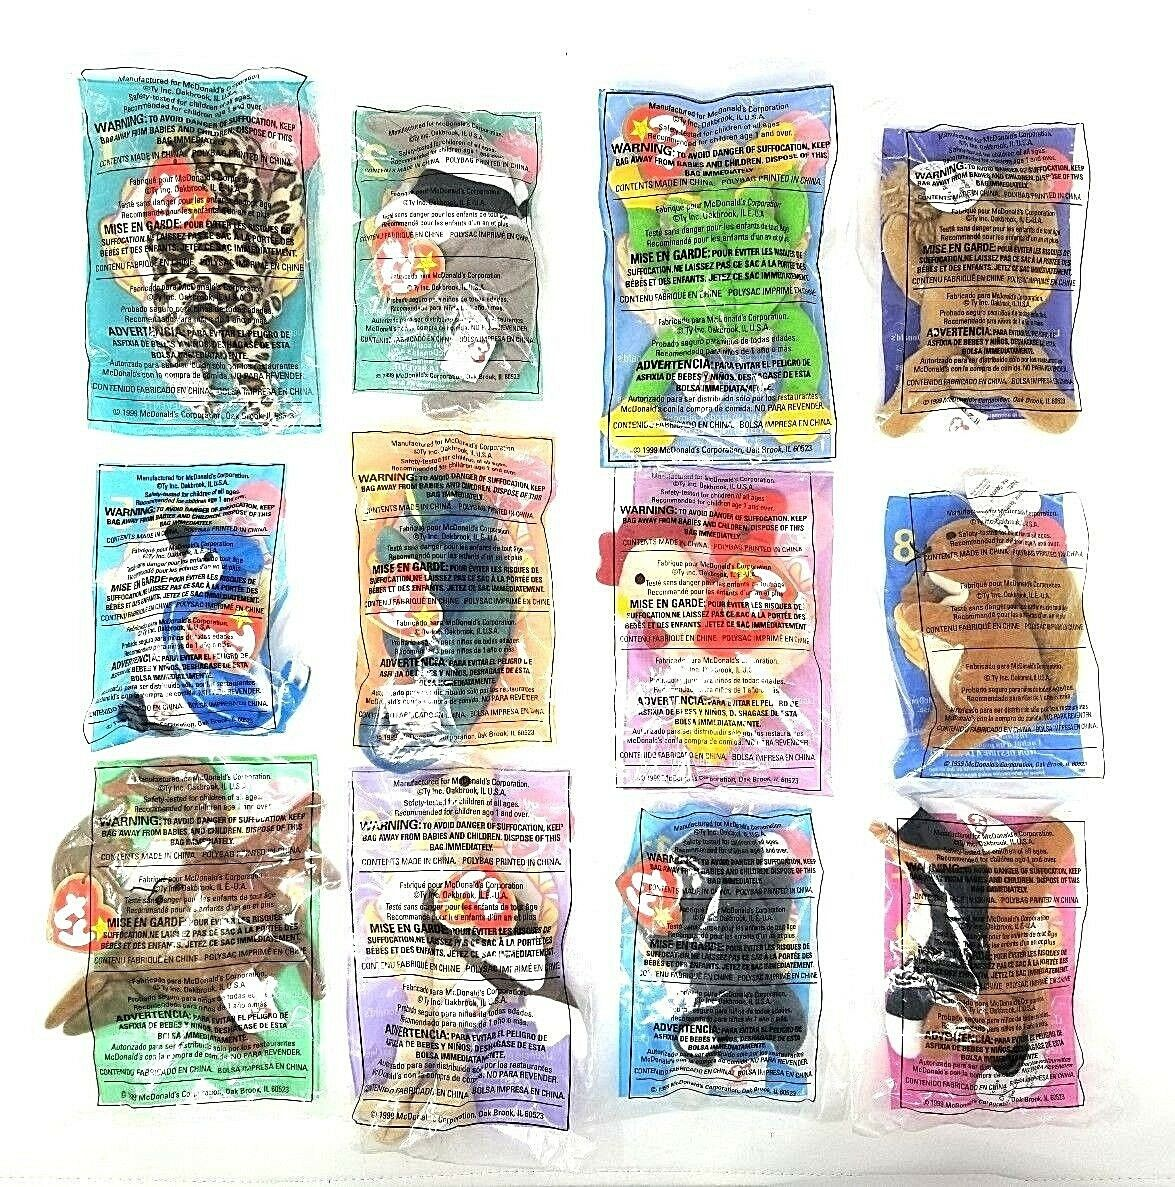 1999 MCDONALD'S TY TEENIE BEANIE BABIES BABIES BABIES COMPLETE SET OF 12 - FACTORY SEALED 2e29e0